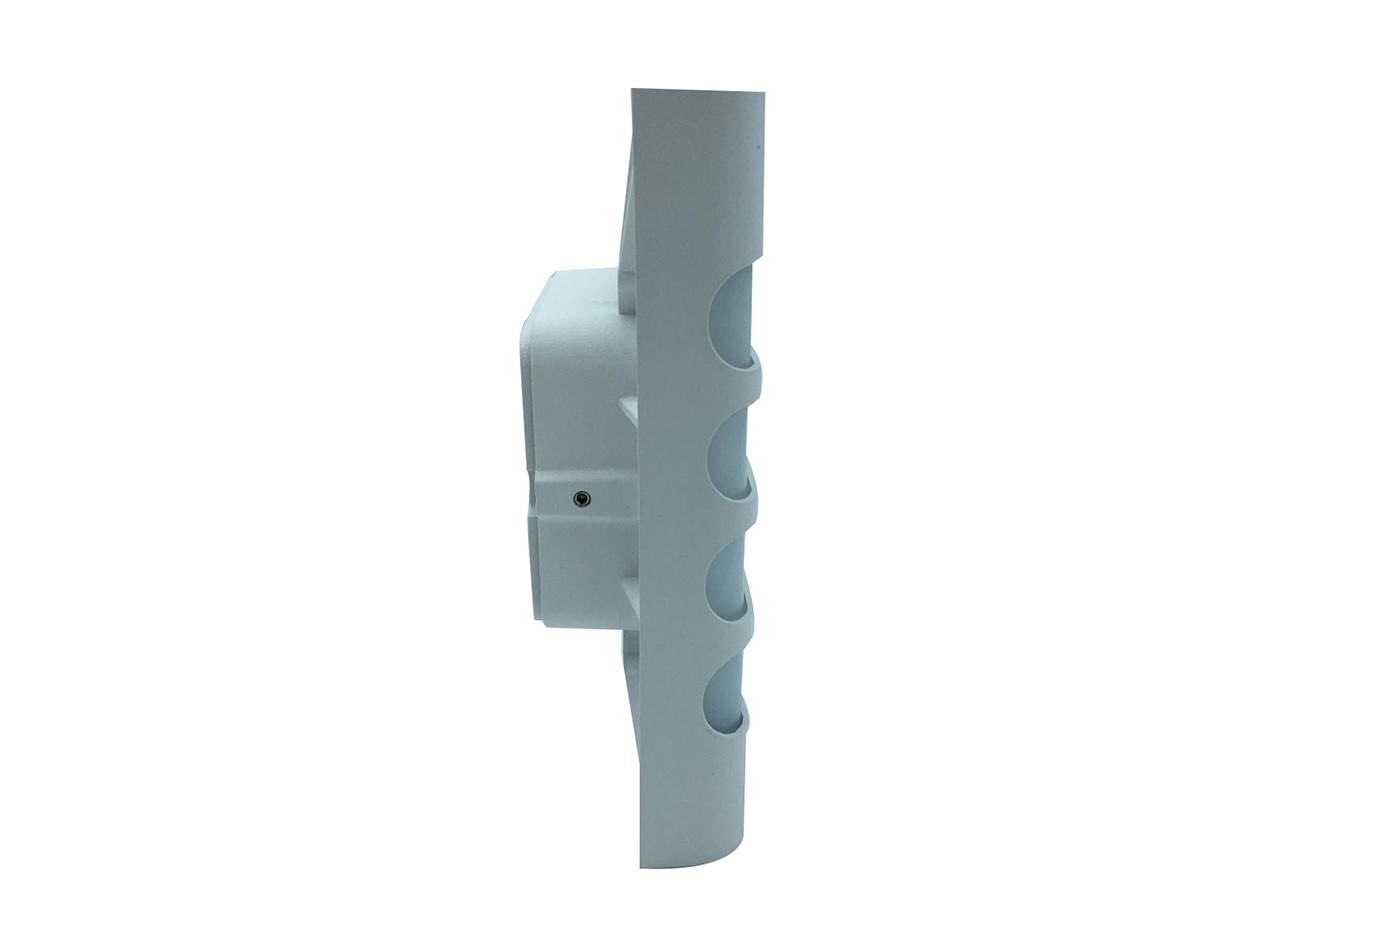 Bes 25712 applique beselettronica lampada parete bianco